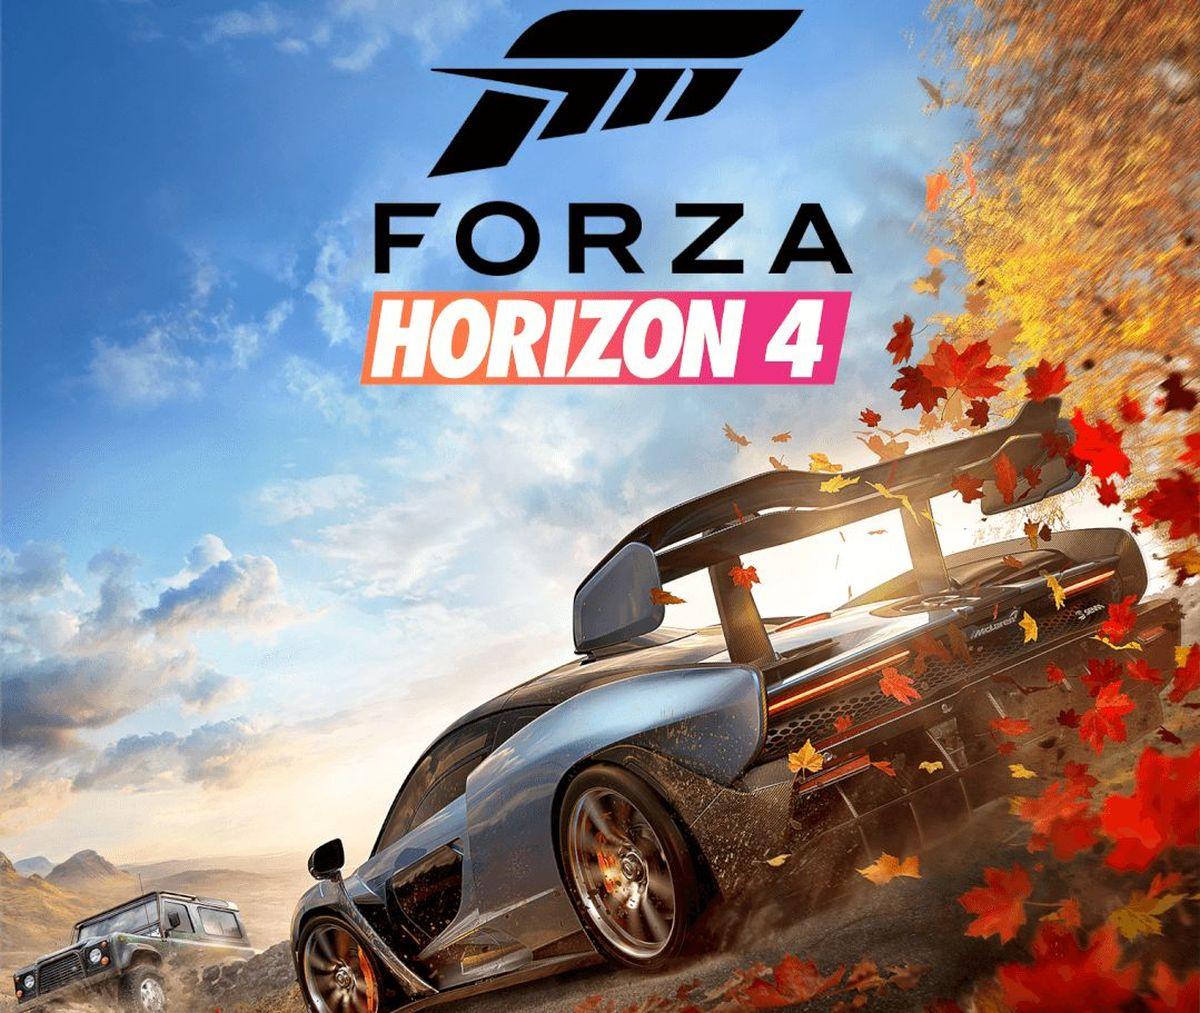 La jaquette de Forza Horizon 4